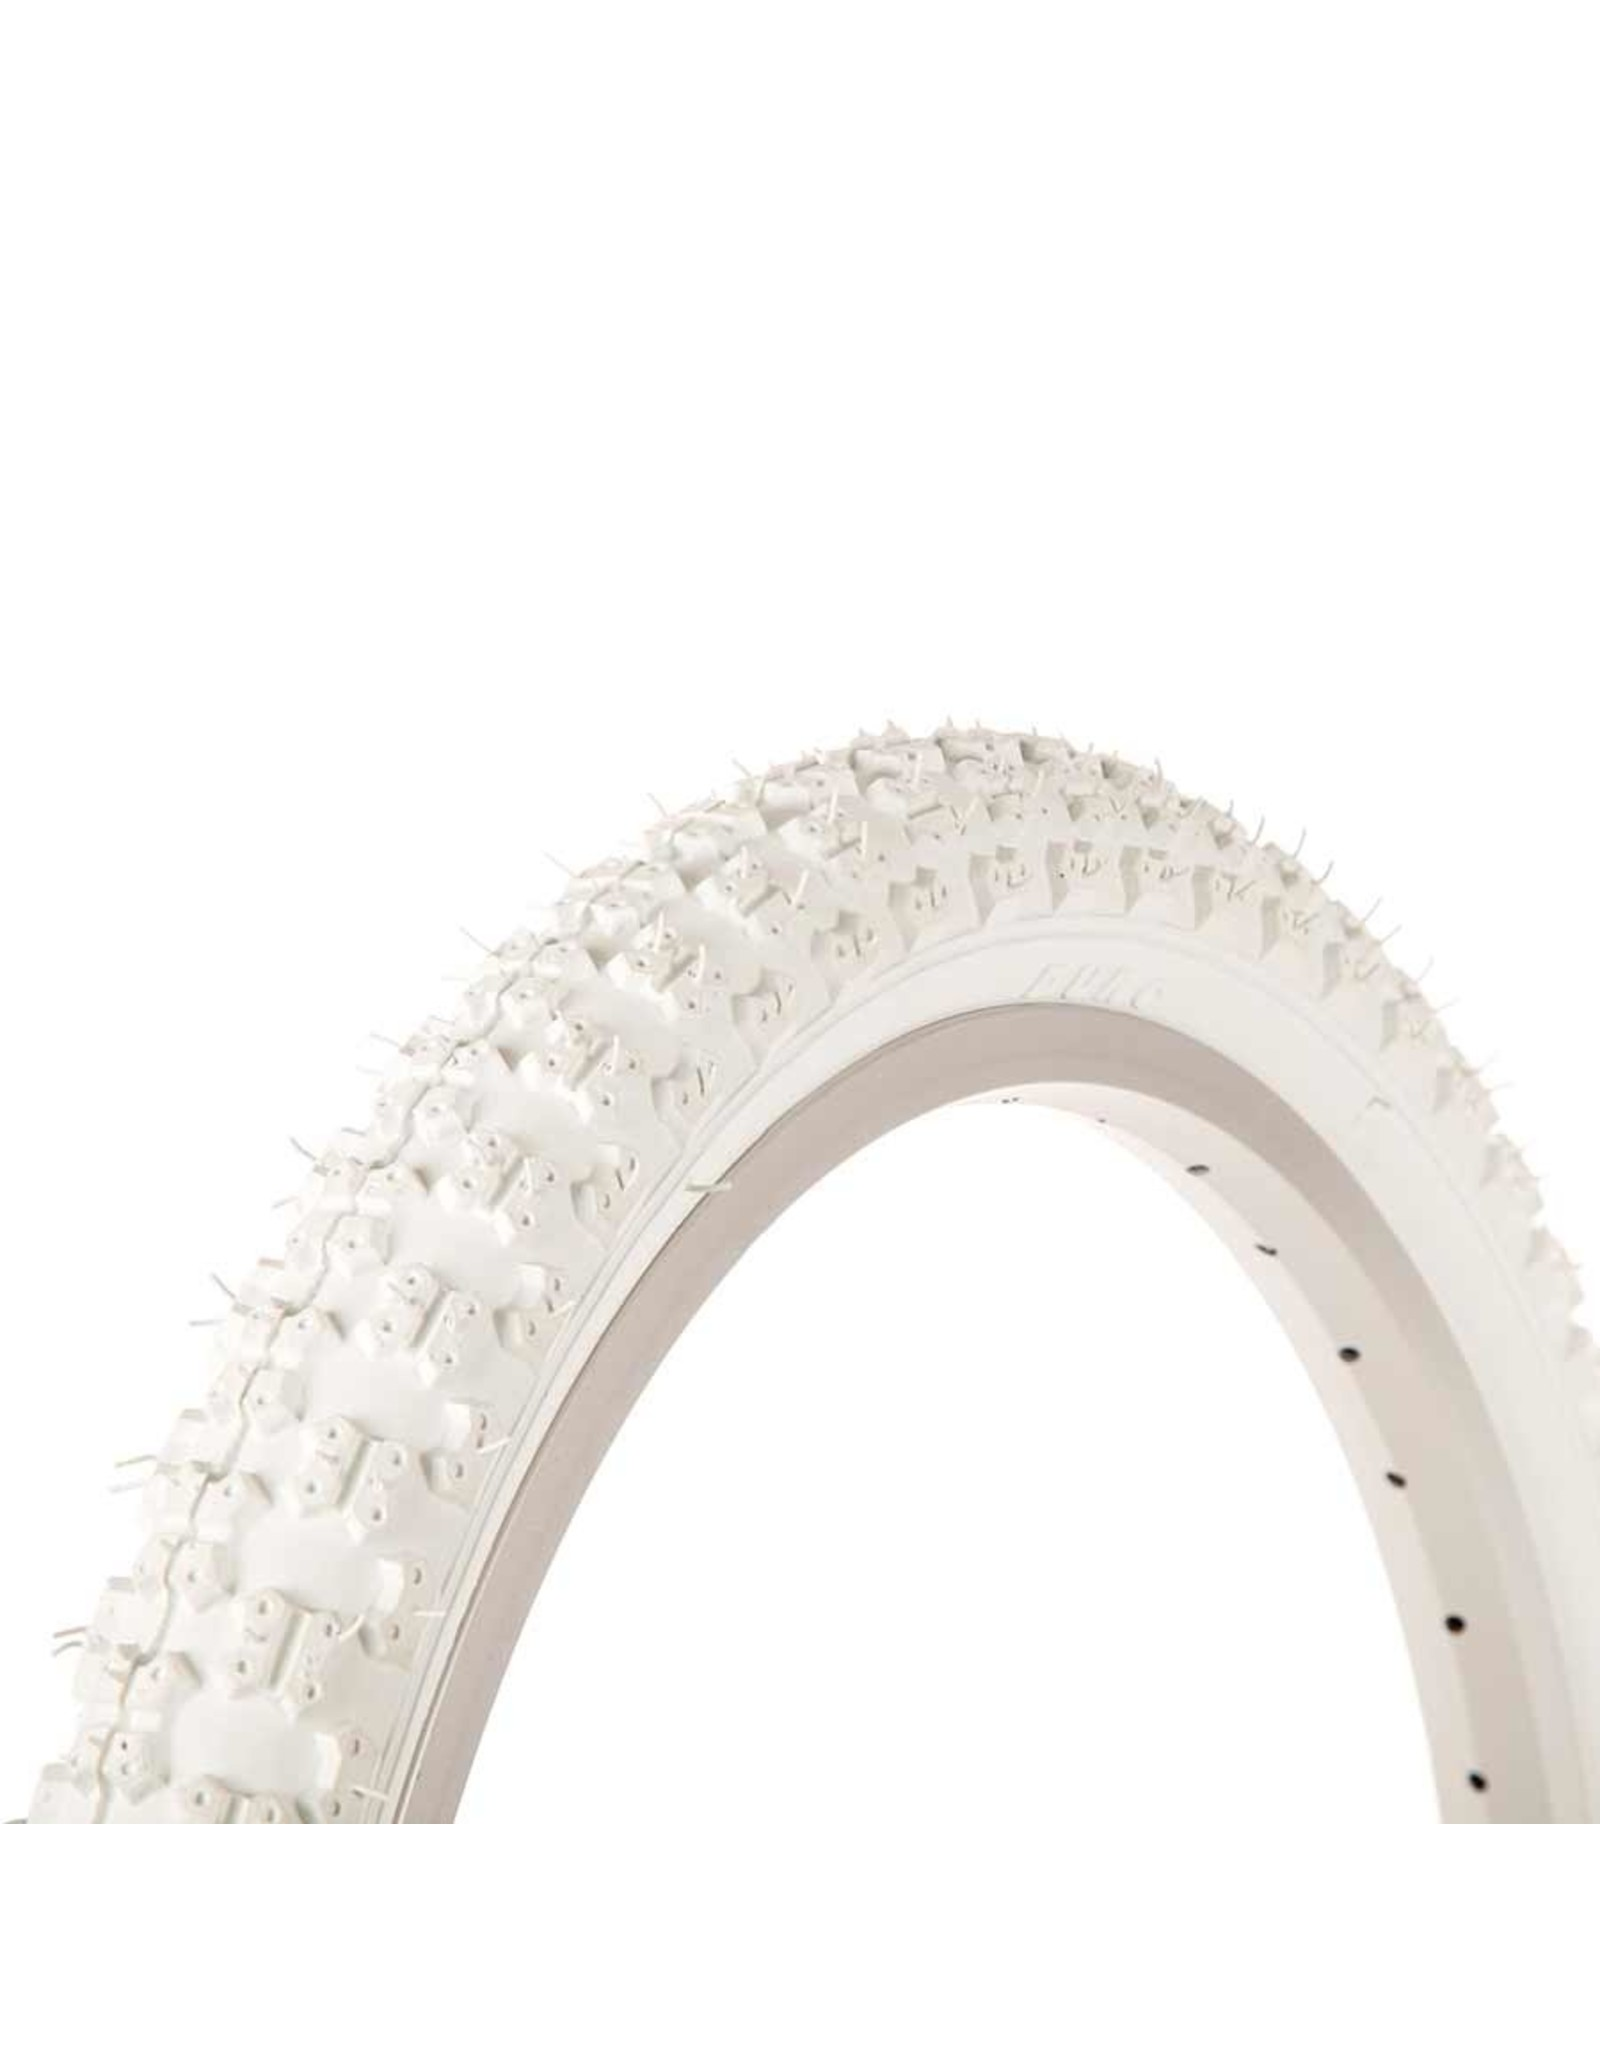 EVO EVO, Splash, Tire, 20''x2.125, Wire, Clincher, White